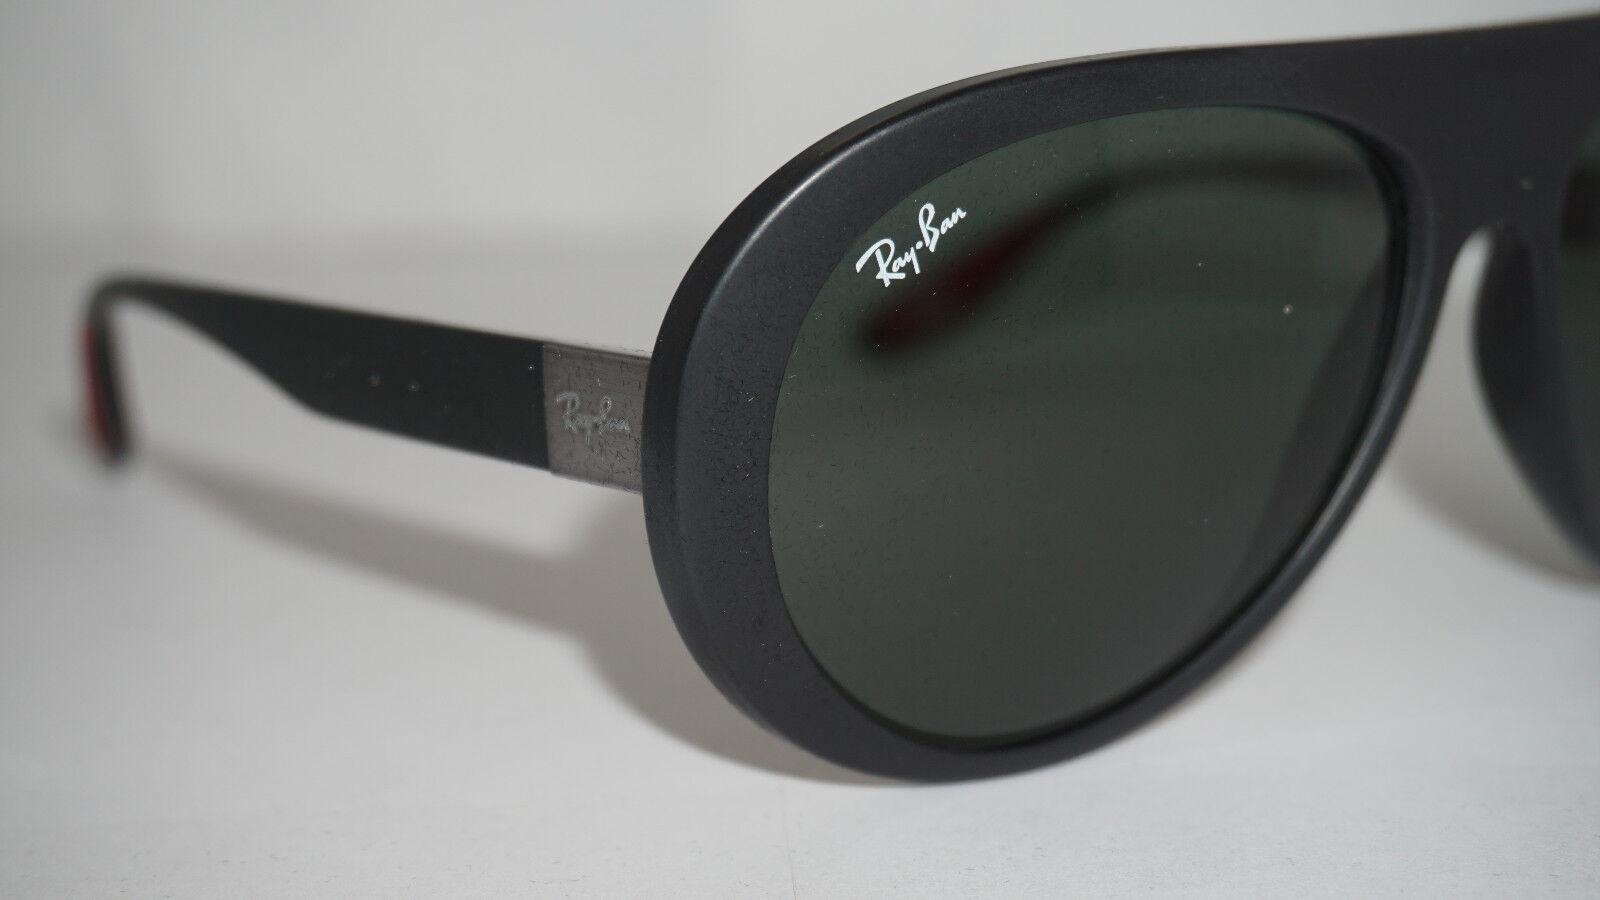 2652005c296 Ray Ban Sunglasses Ferrari Black Green Classic Rb4310m F60271 59 140 for  sale online